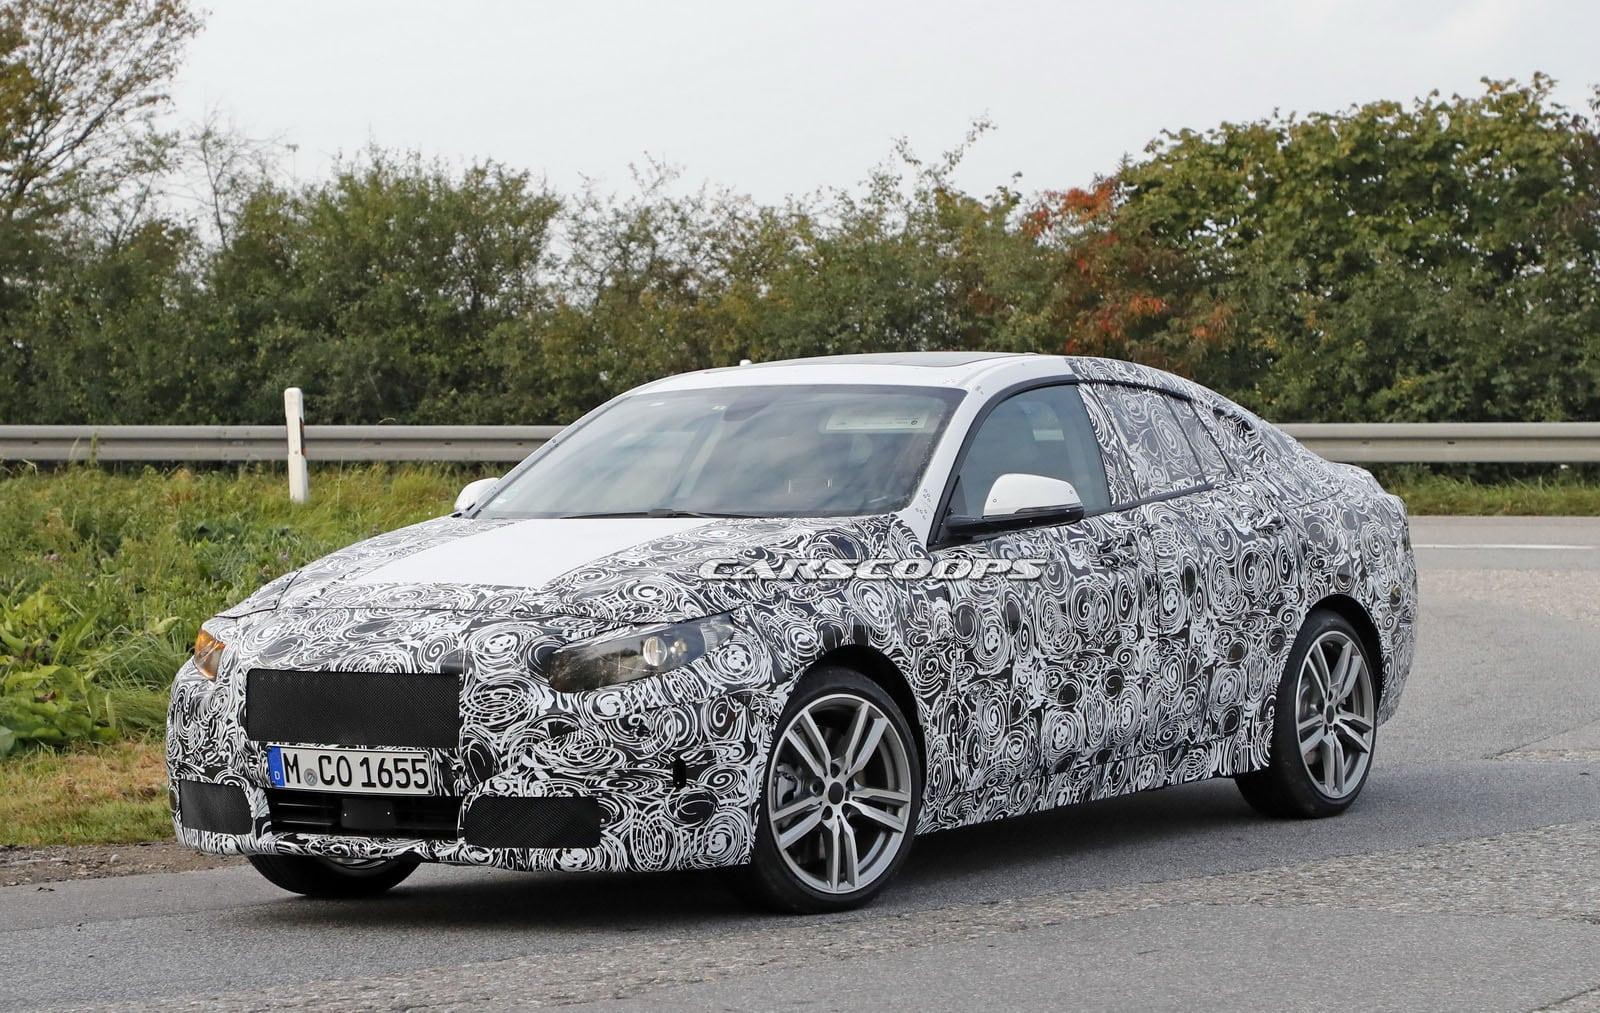 2020 BMW 2 Series Concept